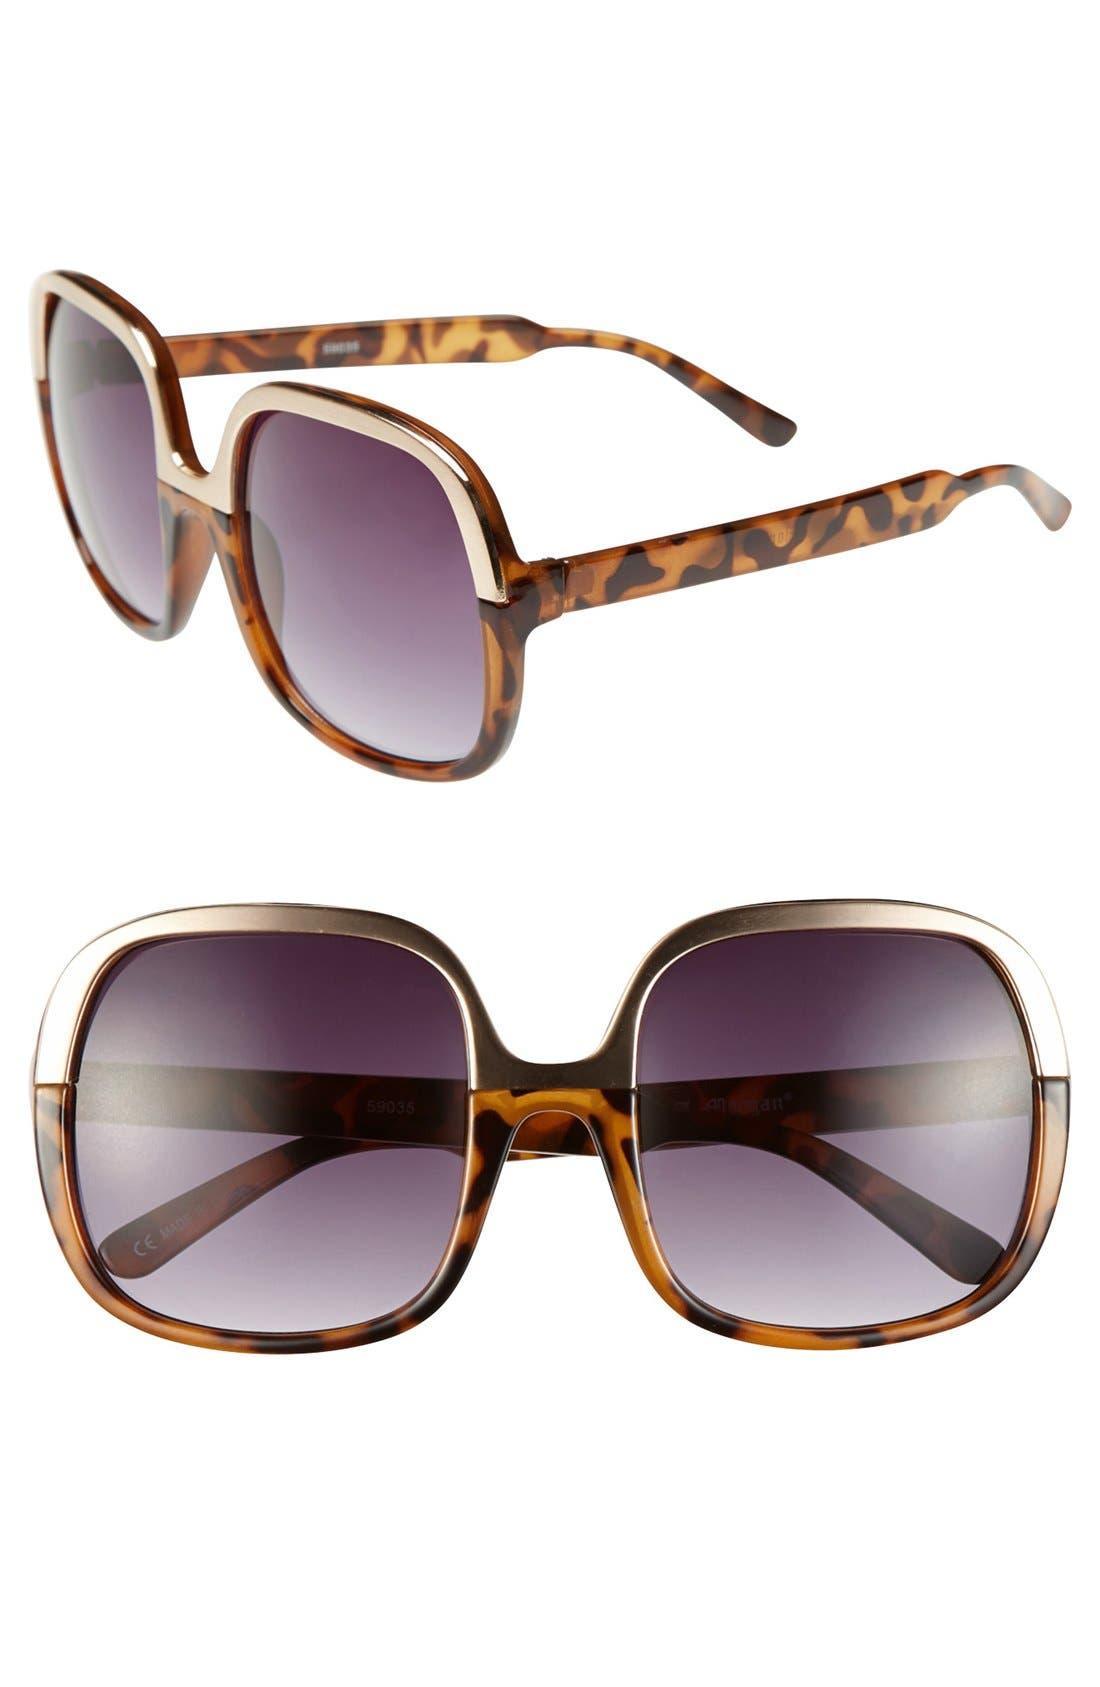 Alternate Image 1 Selected - A.J. Morgan 'Maya' 55mm Sunglasses